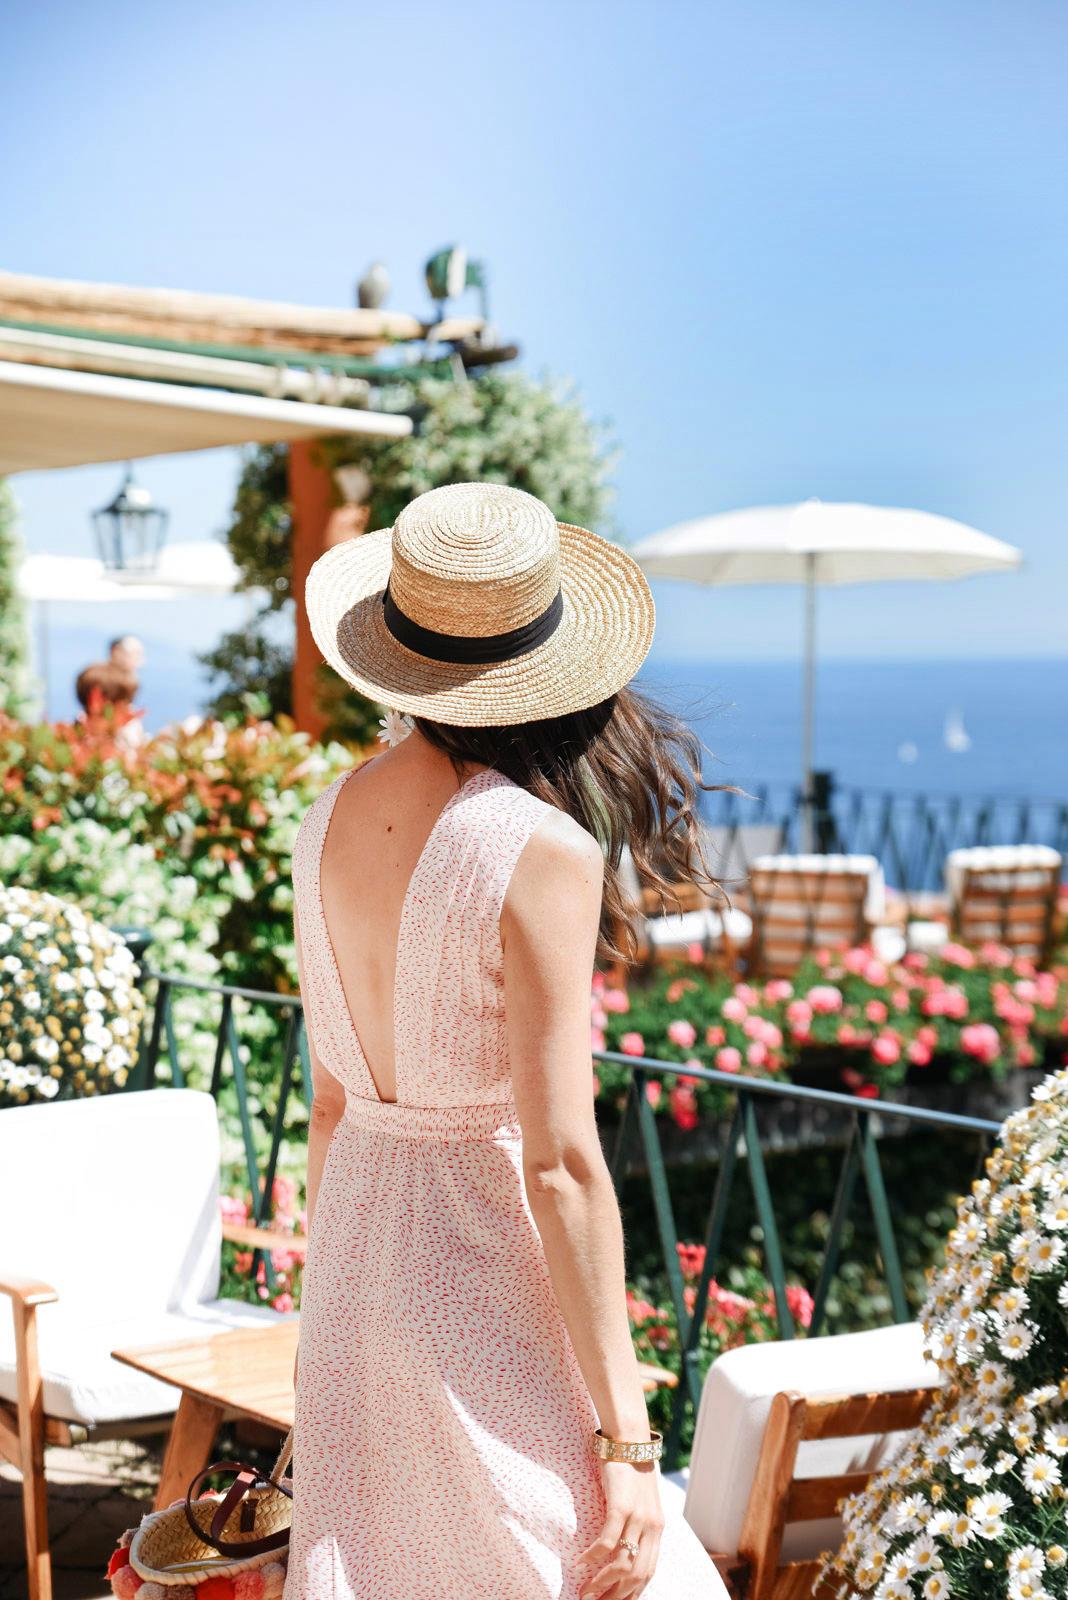 Blog-Mode-And-The-City-Lifestyle-Belmond-HotelOK